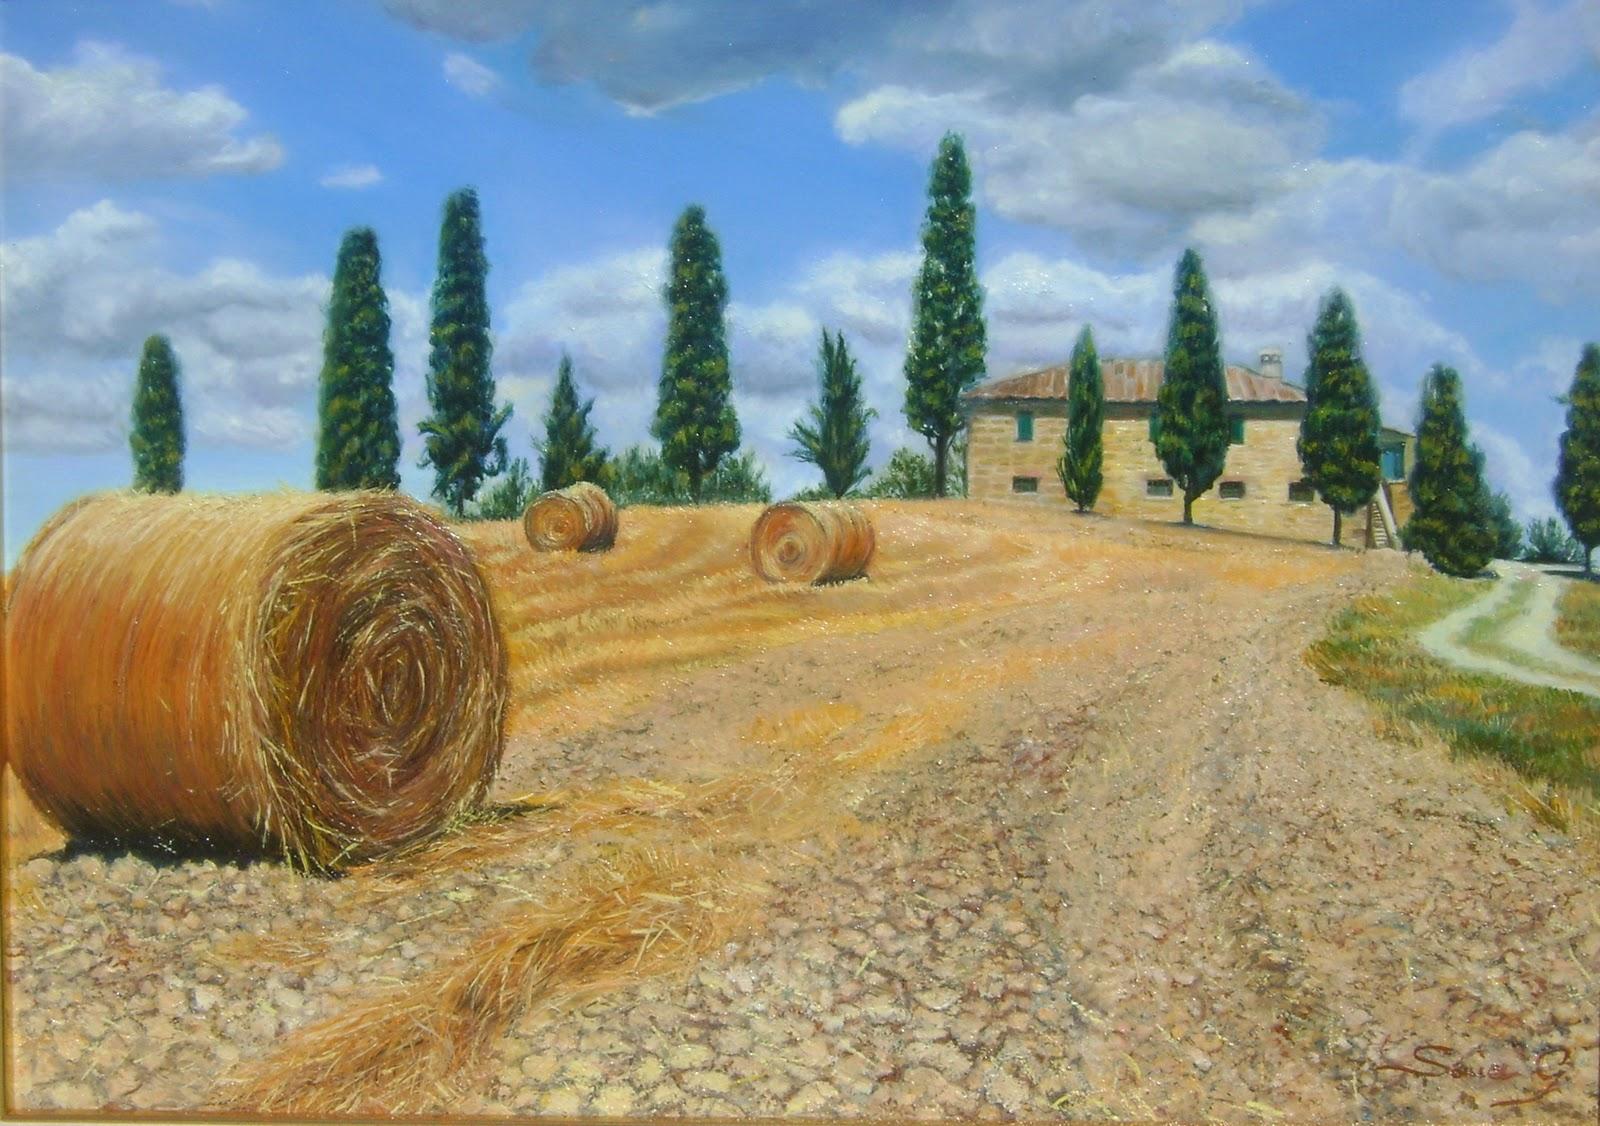 Sonia gramolini campagna toscana for Disegni di cabina di campagna